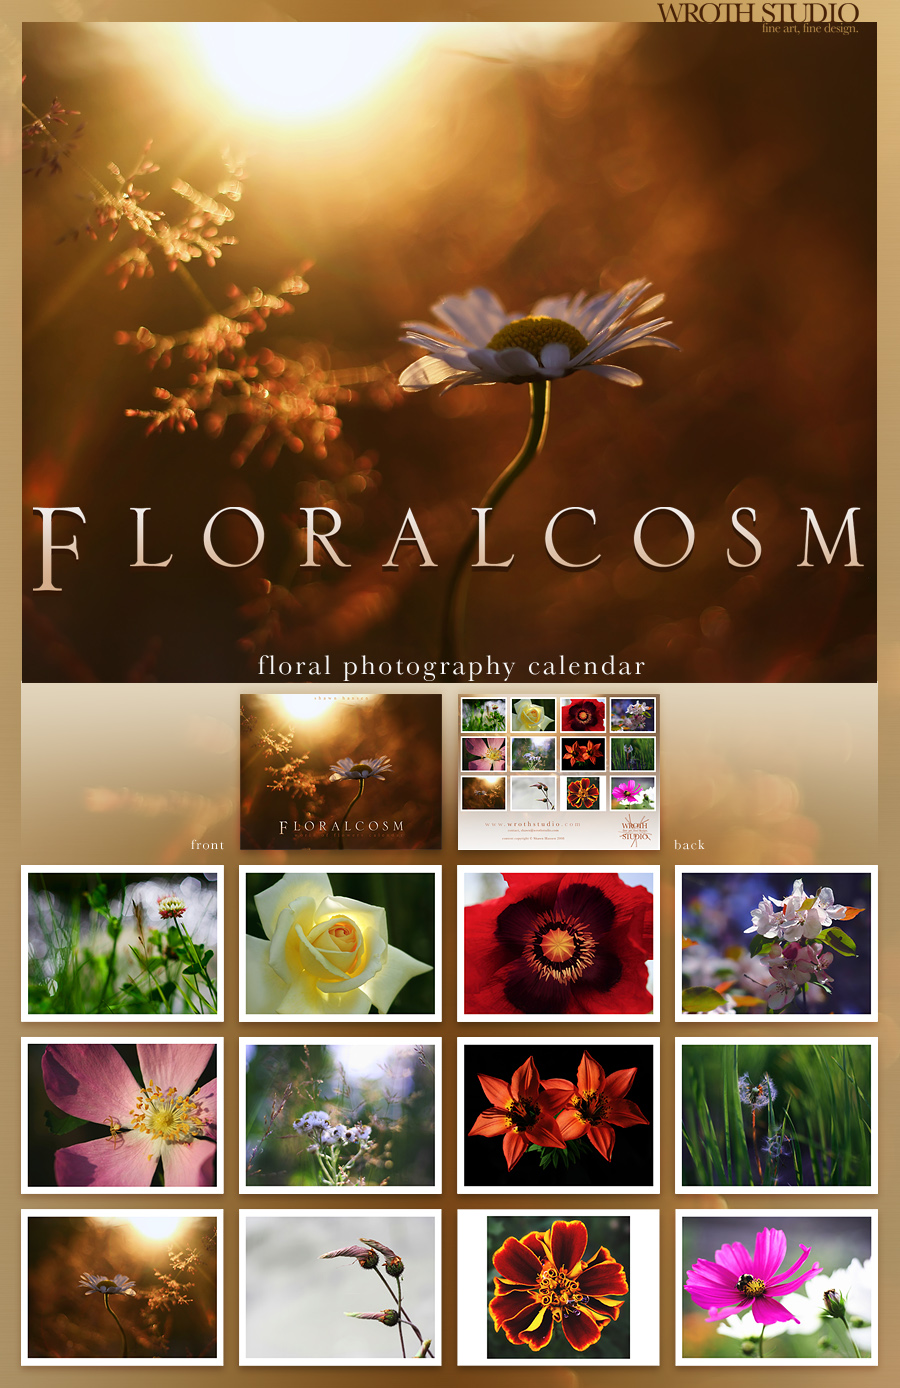 Floralcosm Calendar by wroth